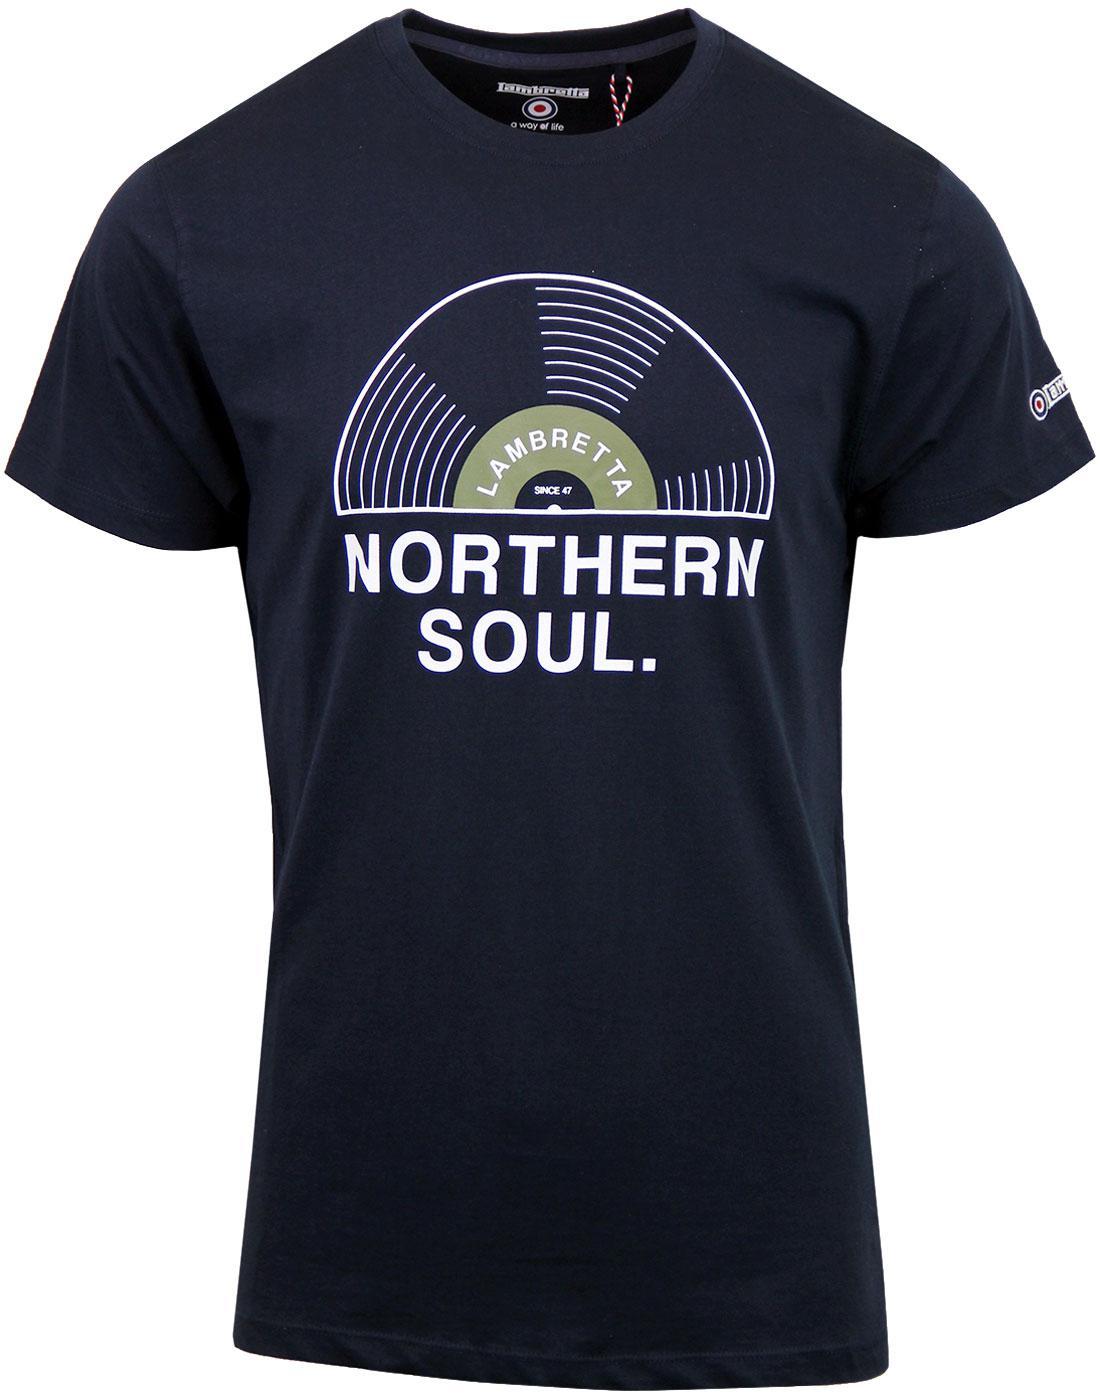 LAMBRETTA Northern Soul Record Print T-shirt NAVY